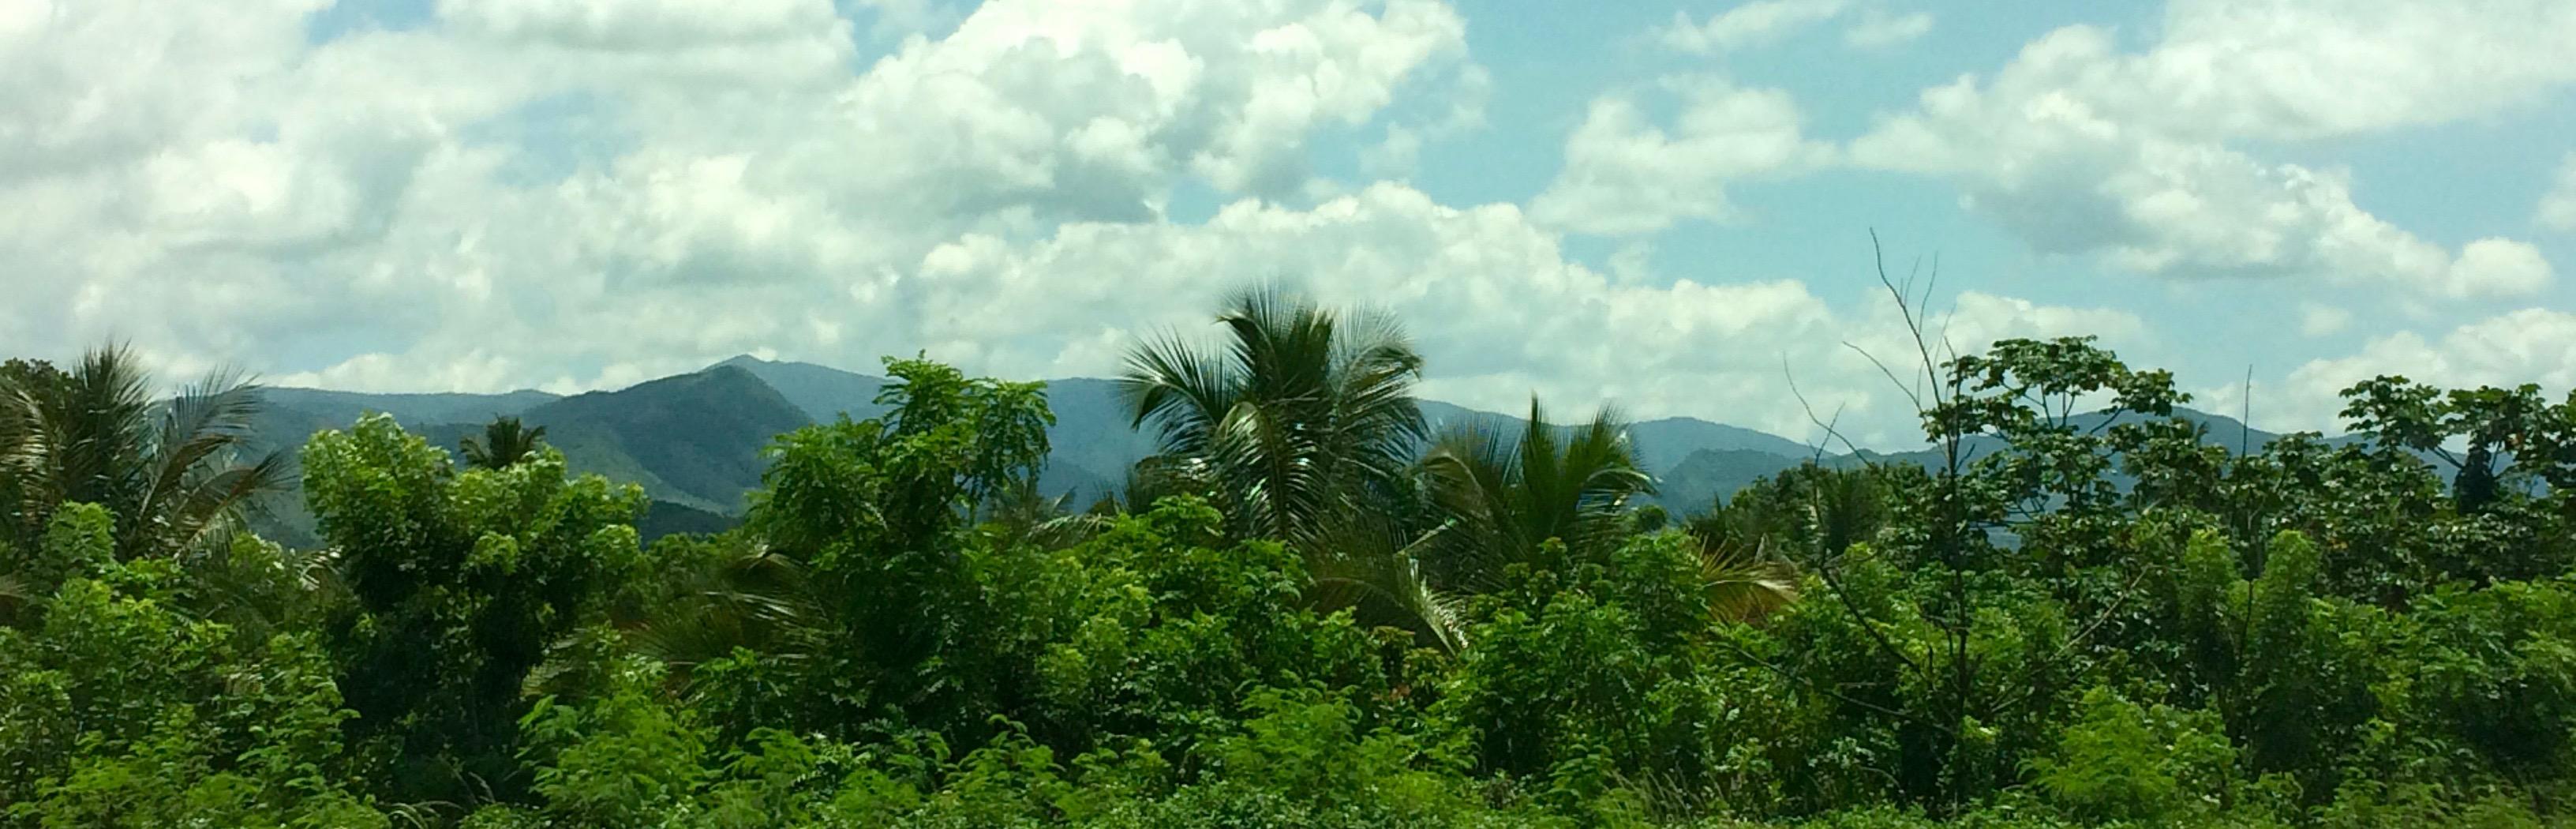 Road from Santo Domingo to Santiago